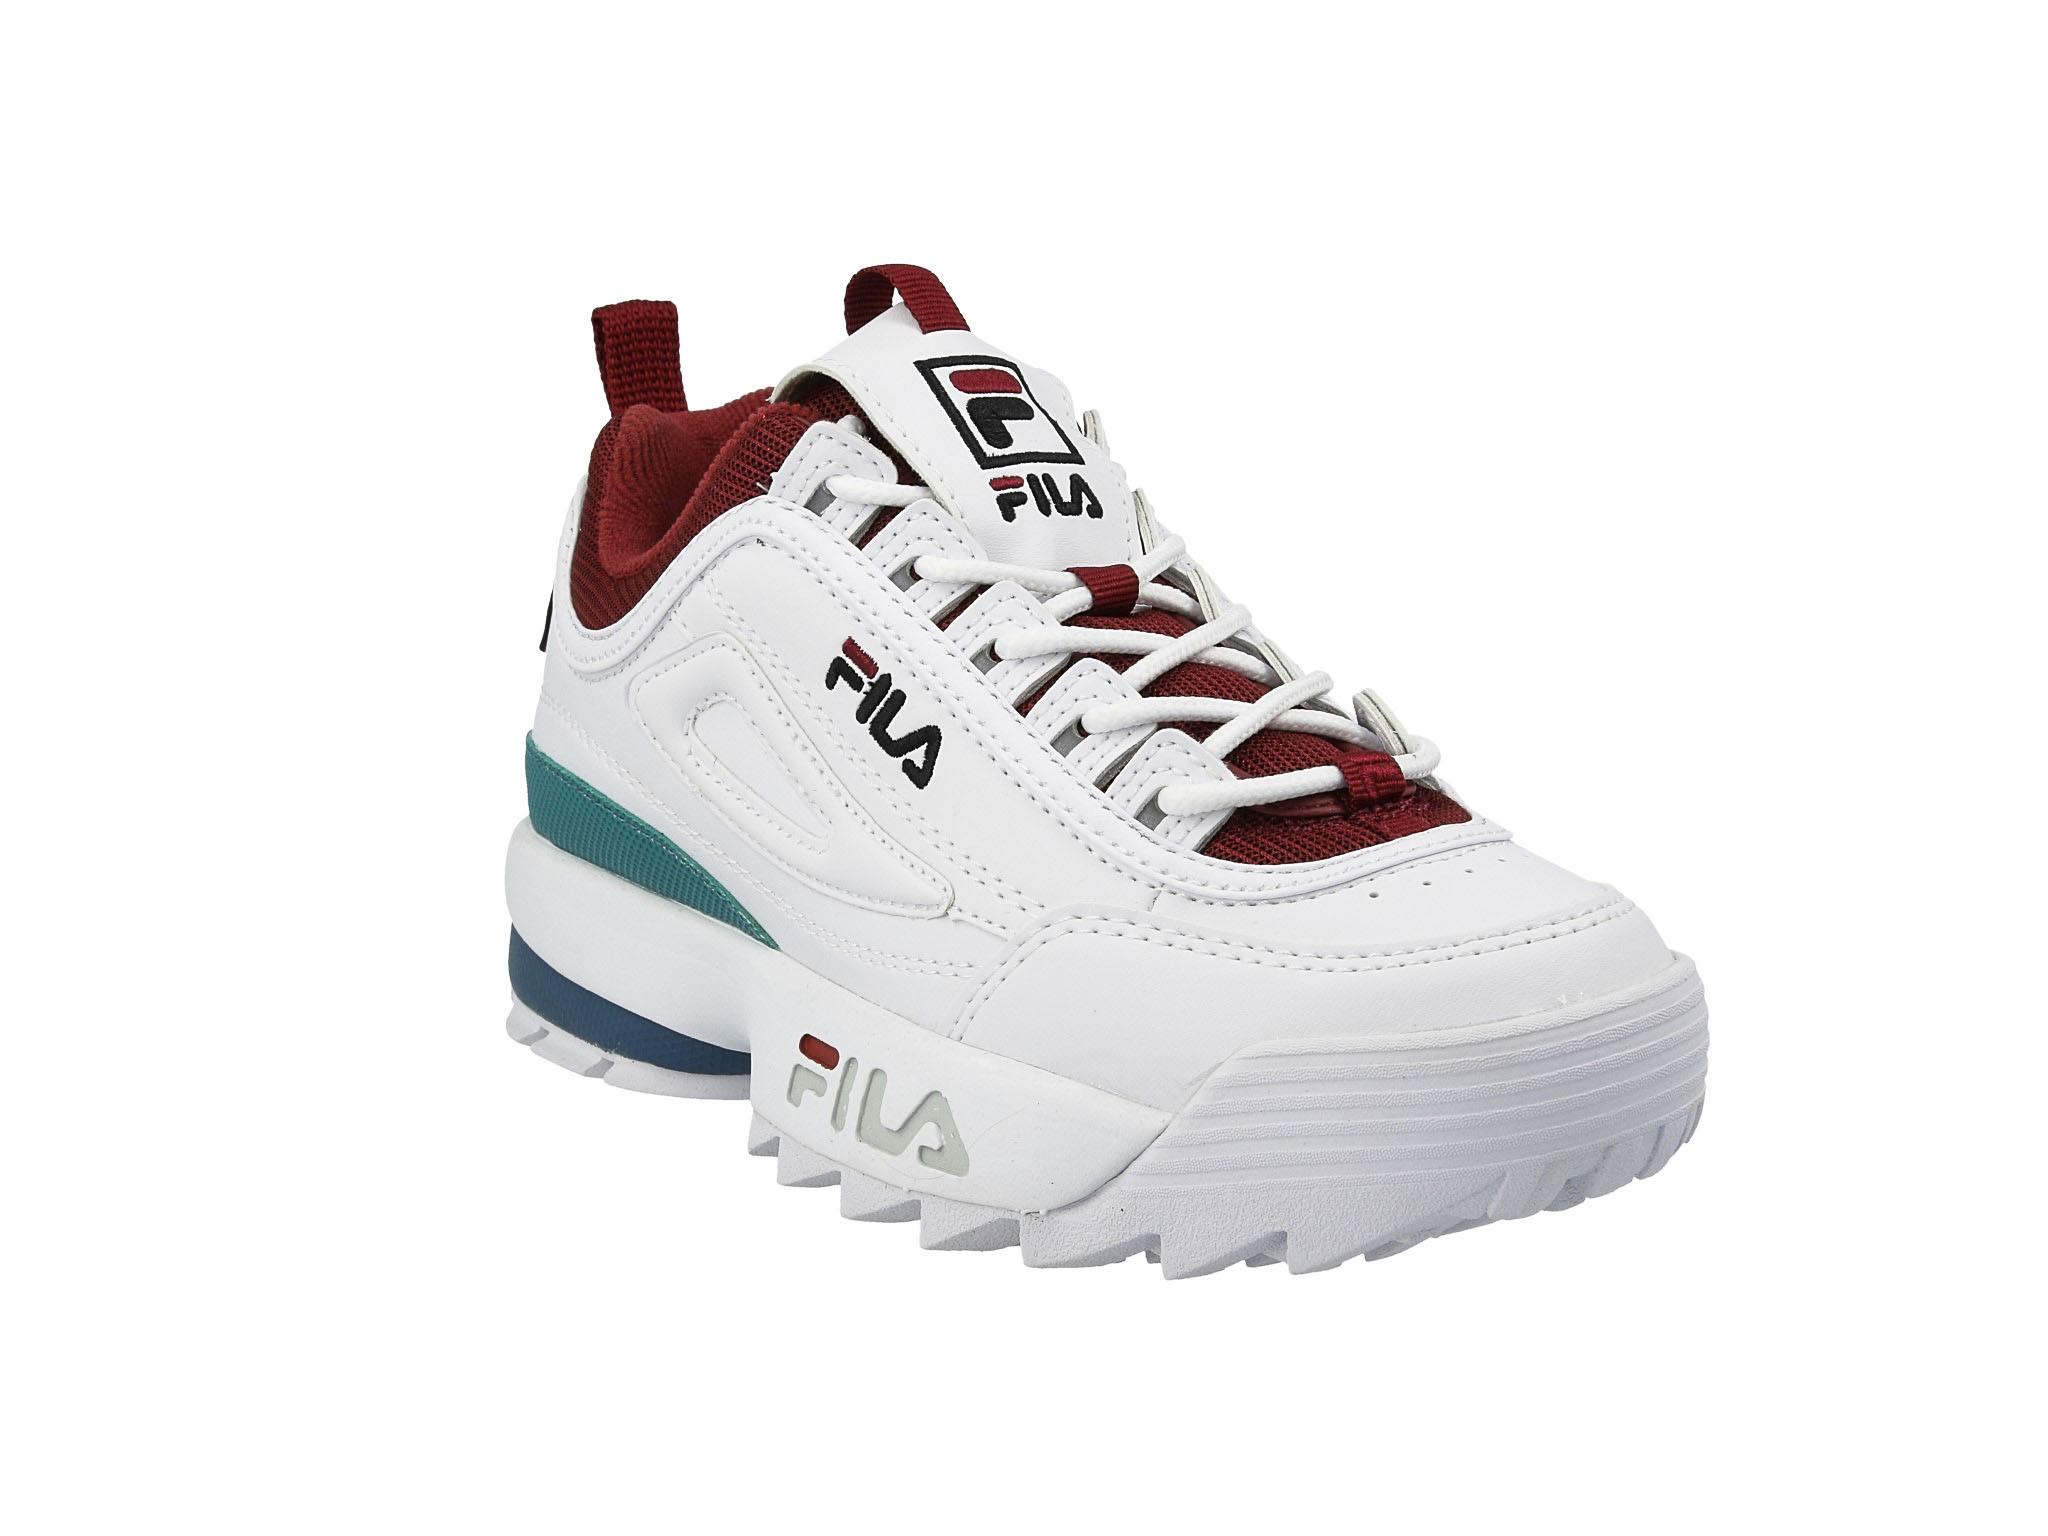 Sneakersy FILA Disruptor Cb Low Wmn 1010604.02H WhiteRhubarb